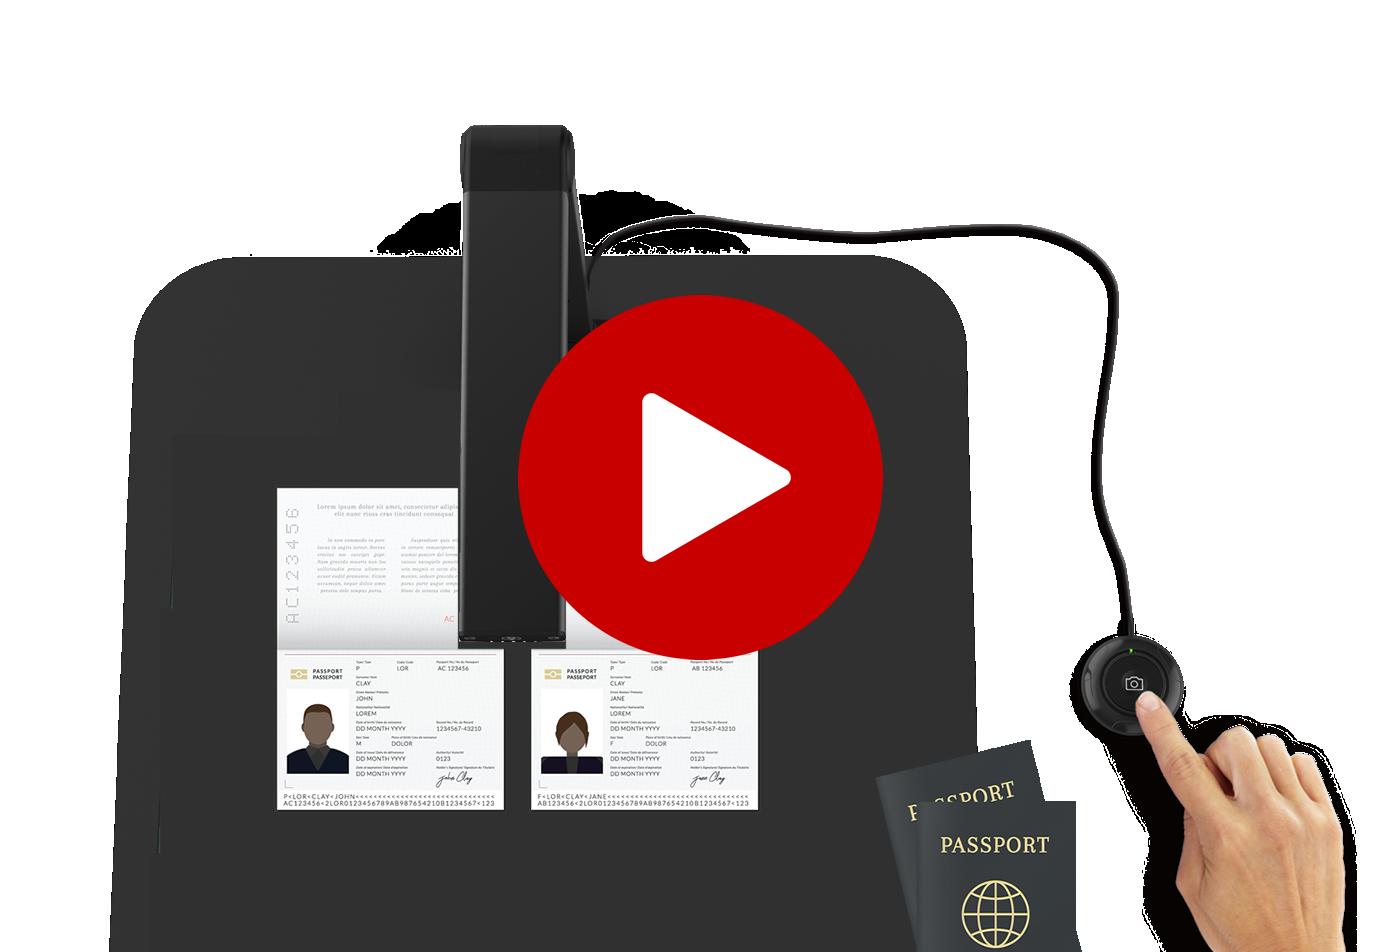 Iriscan Desk 5 Security Passport Id Camera Scanner